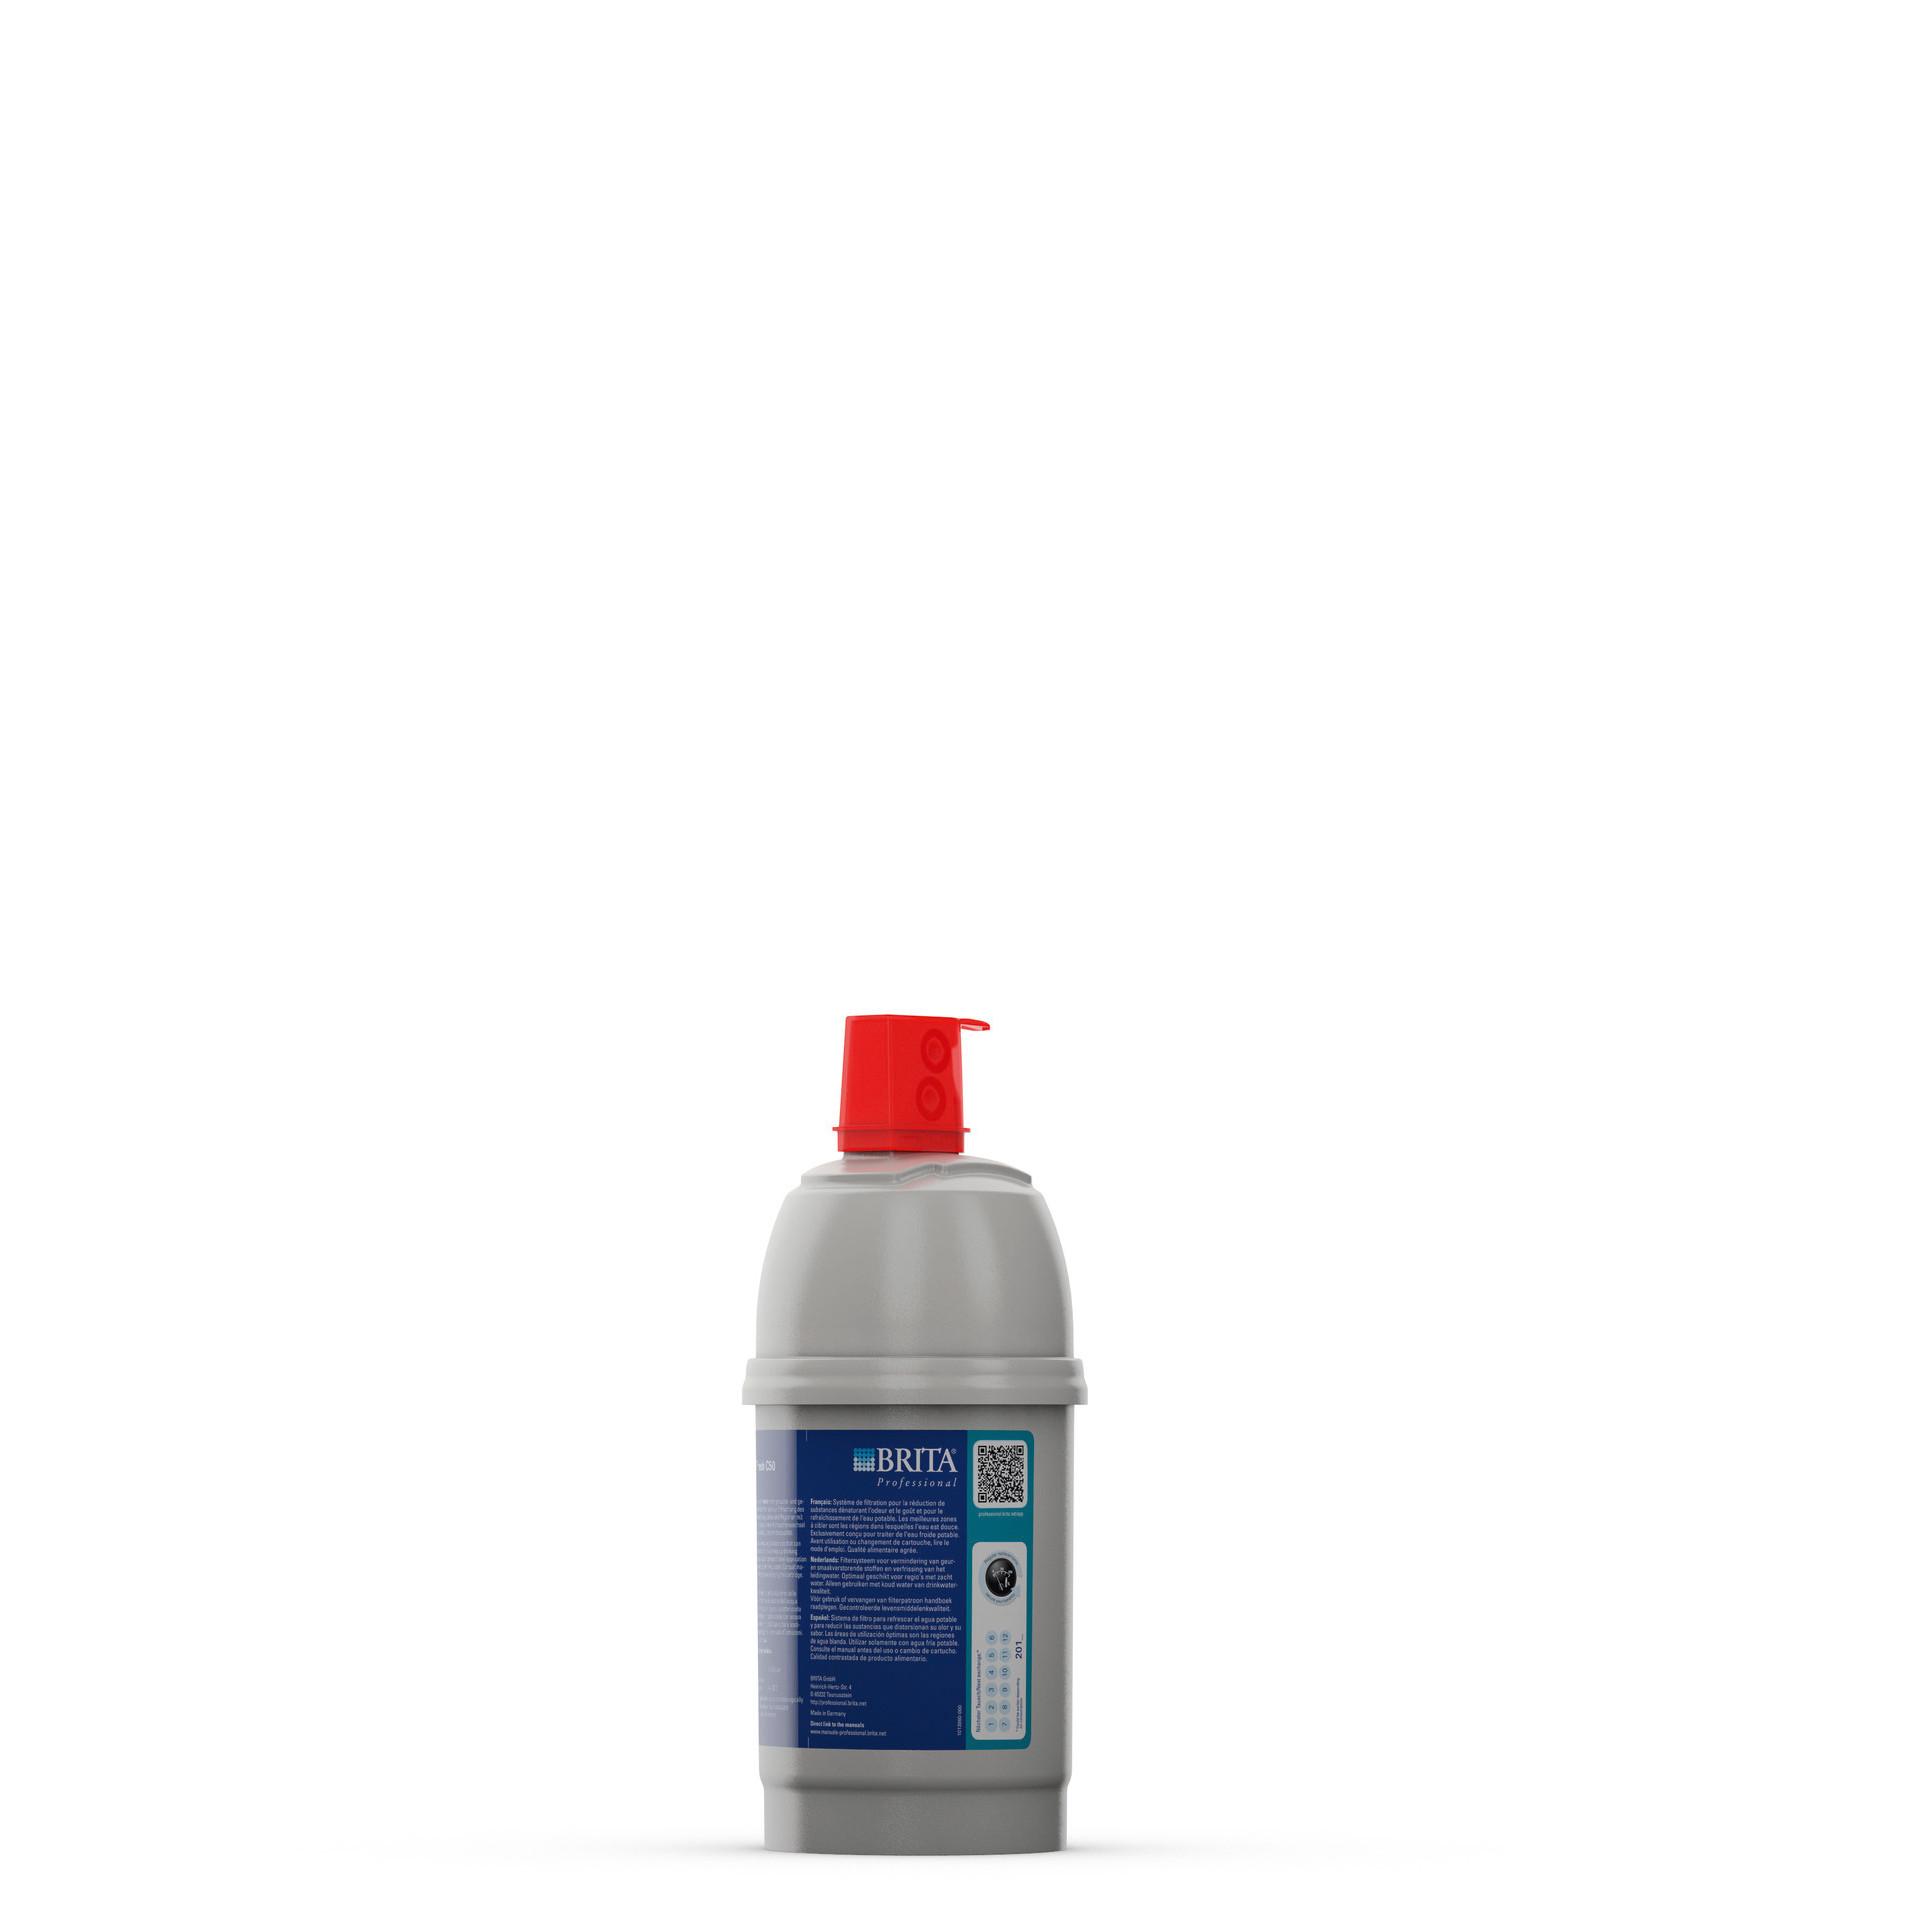 Kartusche Purity Fresh C50 119 x 108 x 268 mm